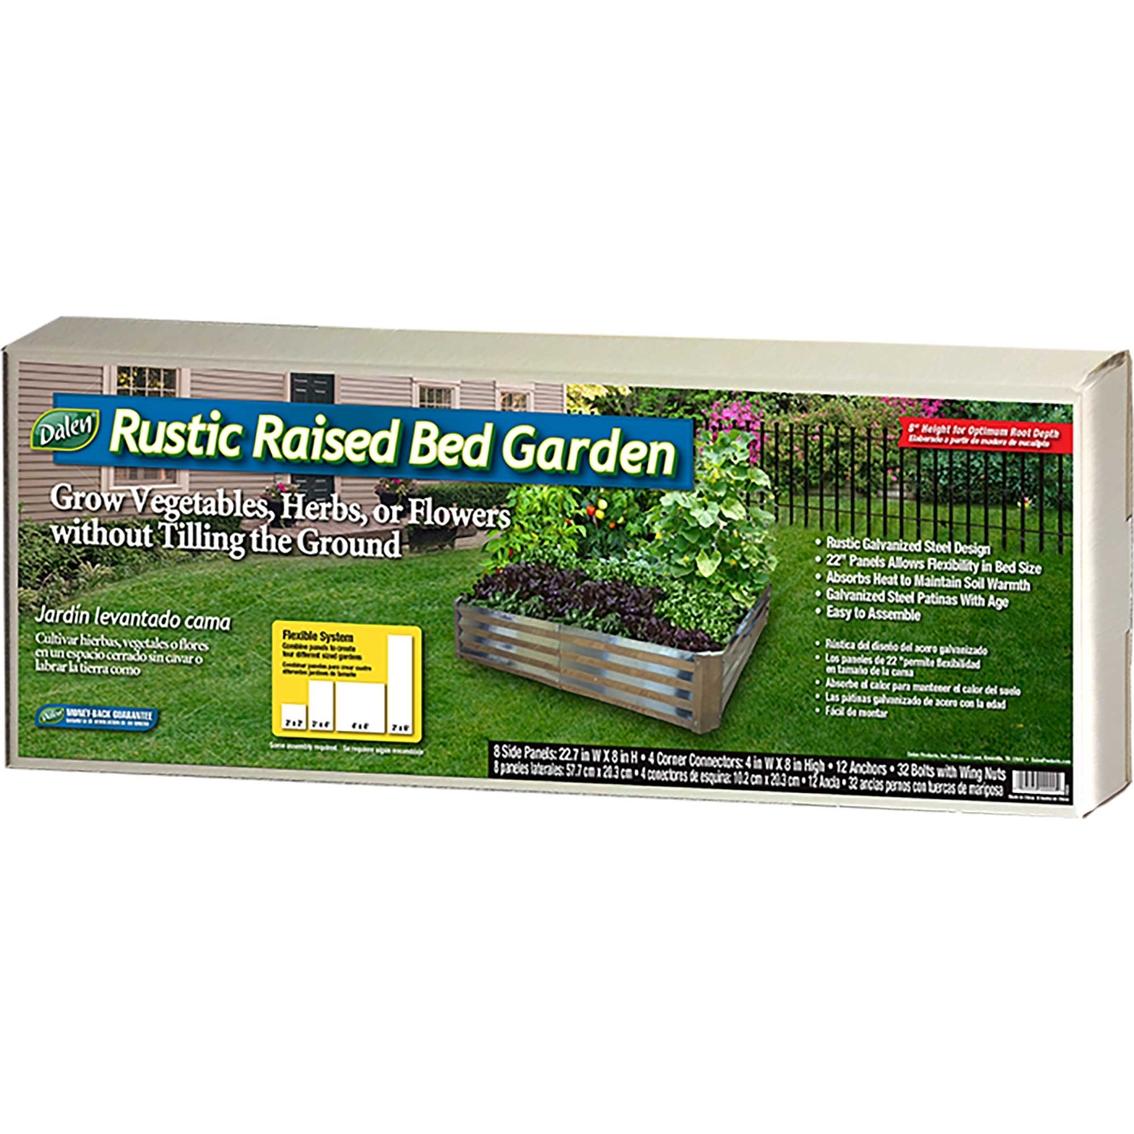 Image of: Gardeneer By Dalen Rustic Raised Garden Bed Ornamental Decor Patio Garden Garage Shop The Exchange